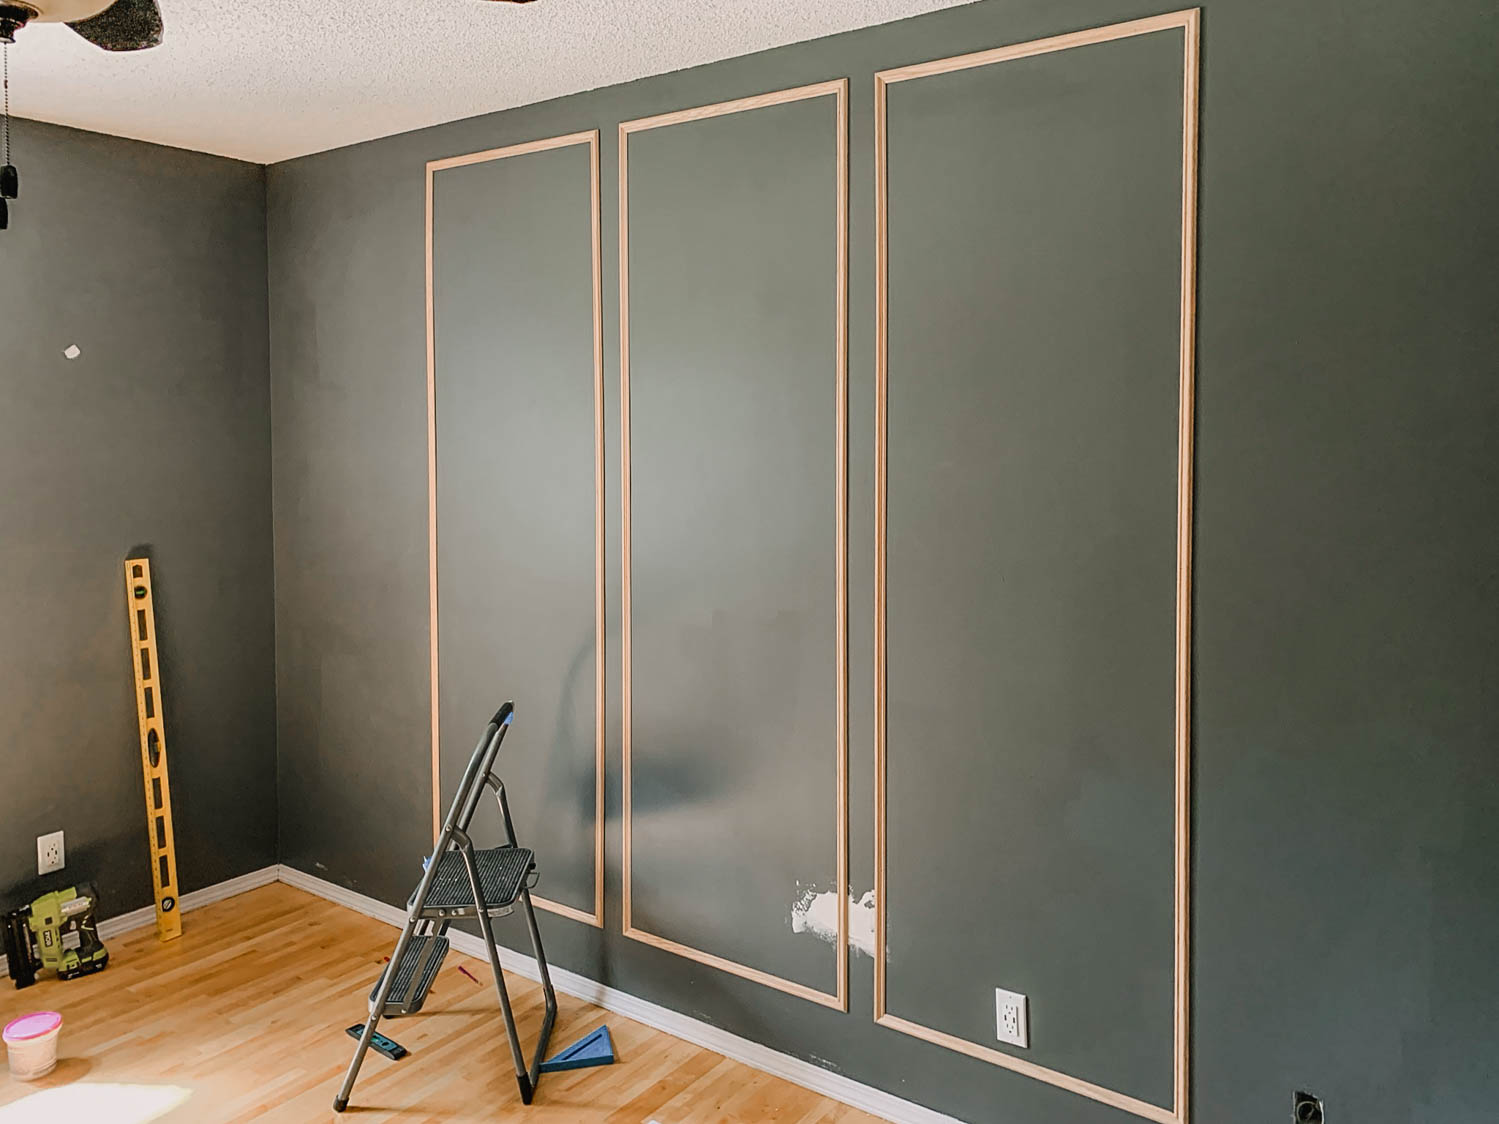 DIY Bedroom Moulding Wall